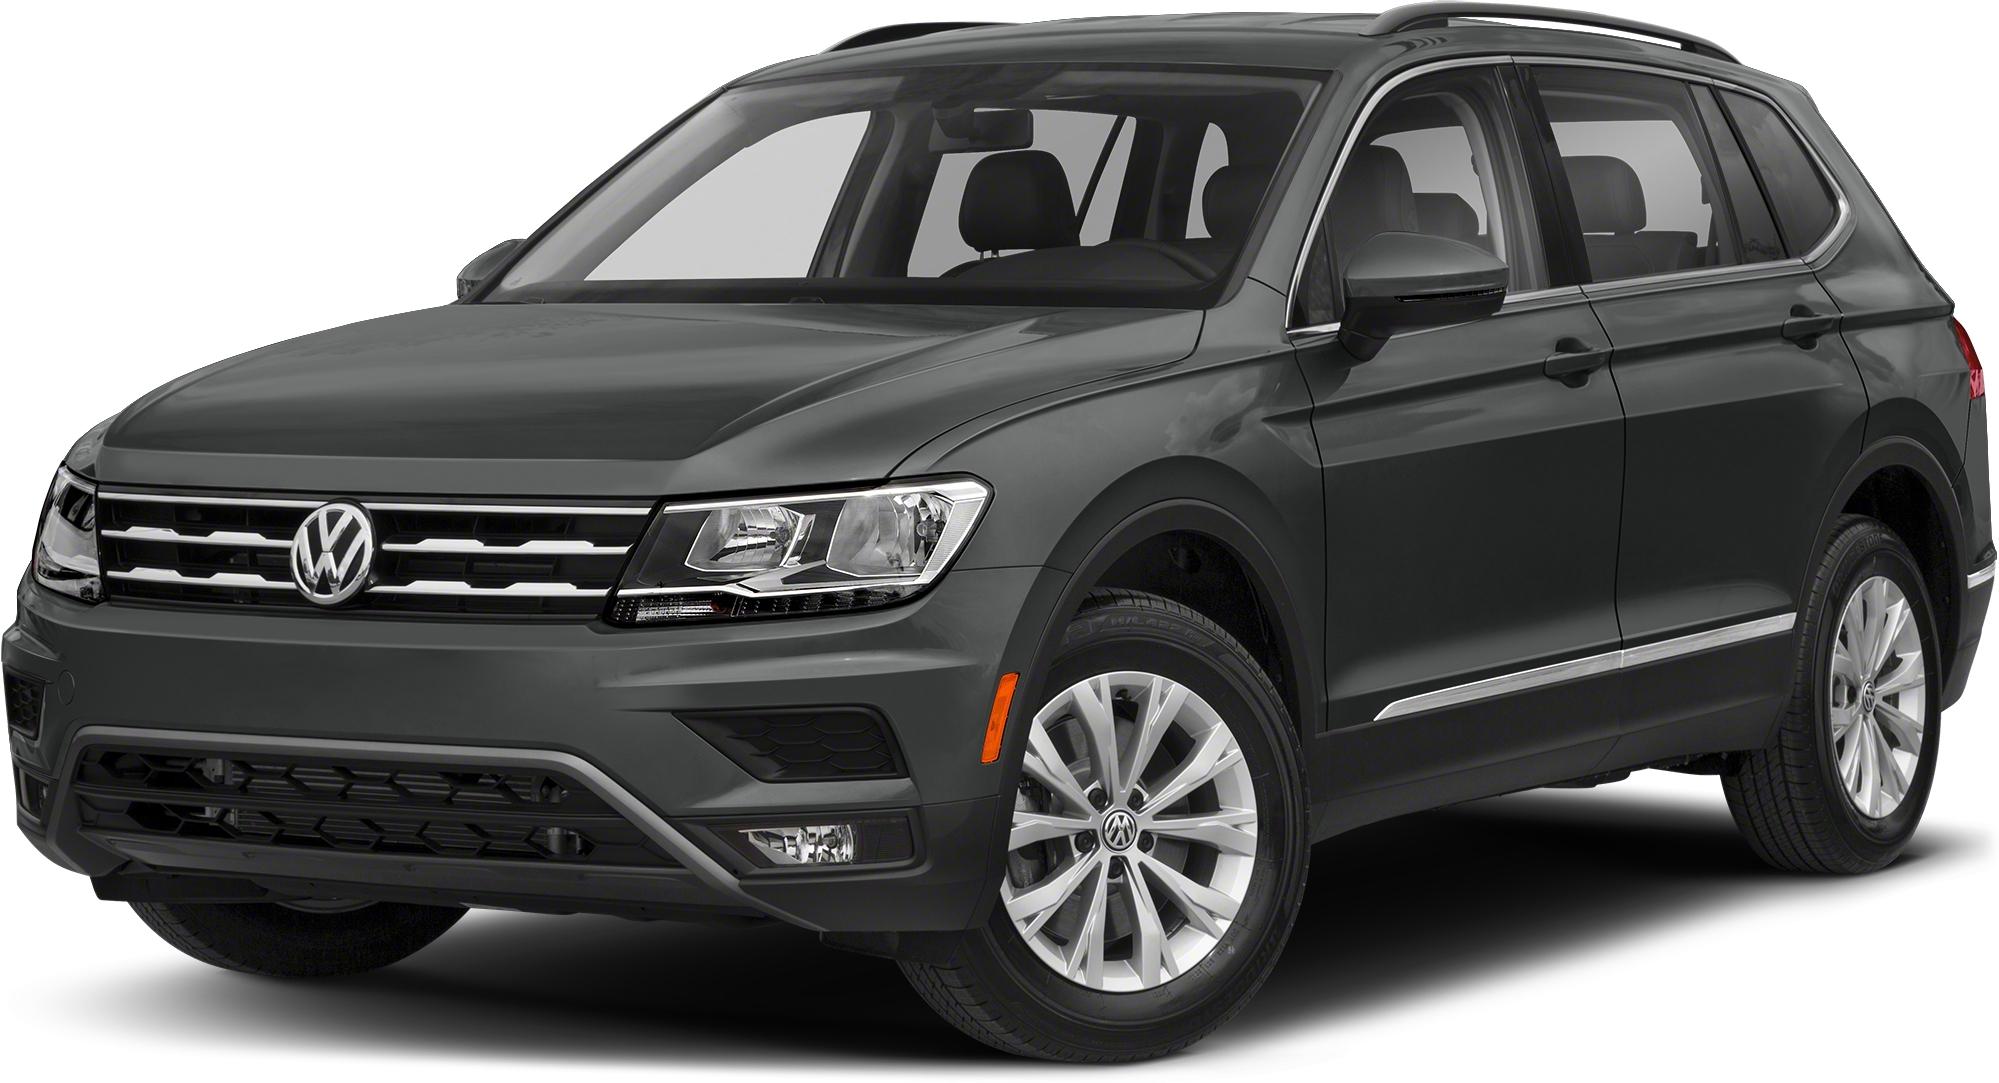 2019 Volkswagen Tiguan Sel Premium R Line Union Nj 27369144